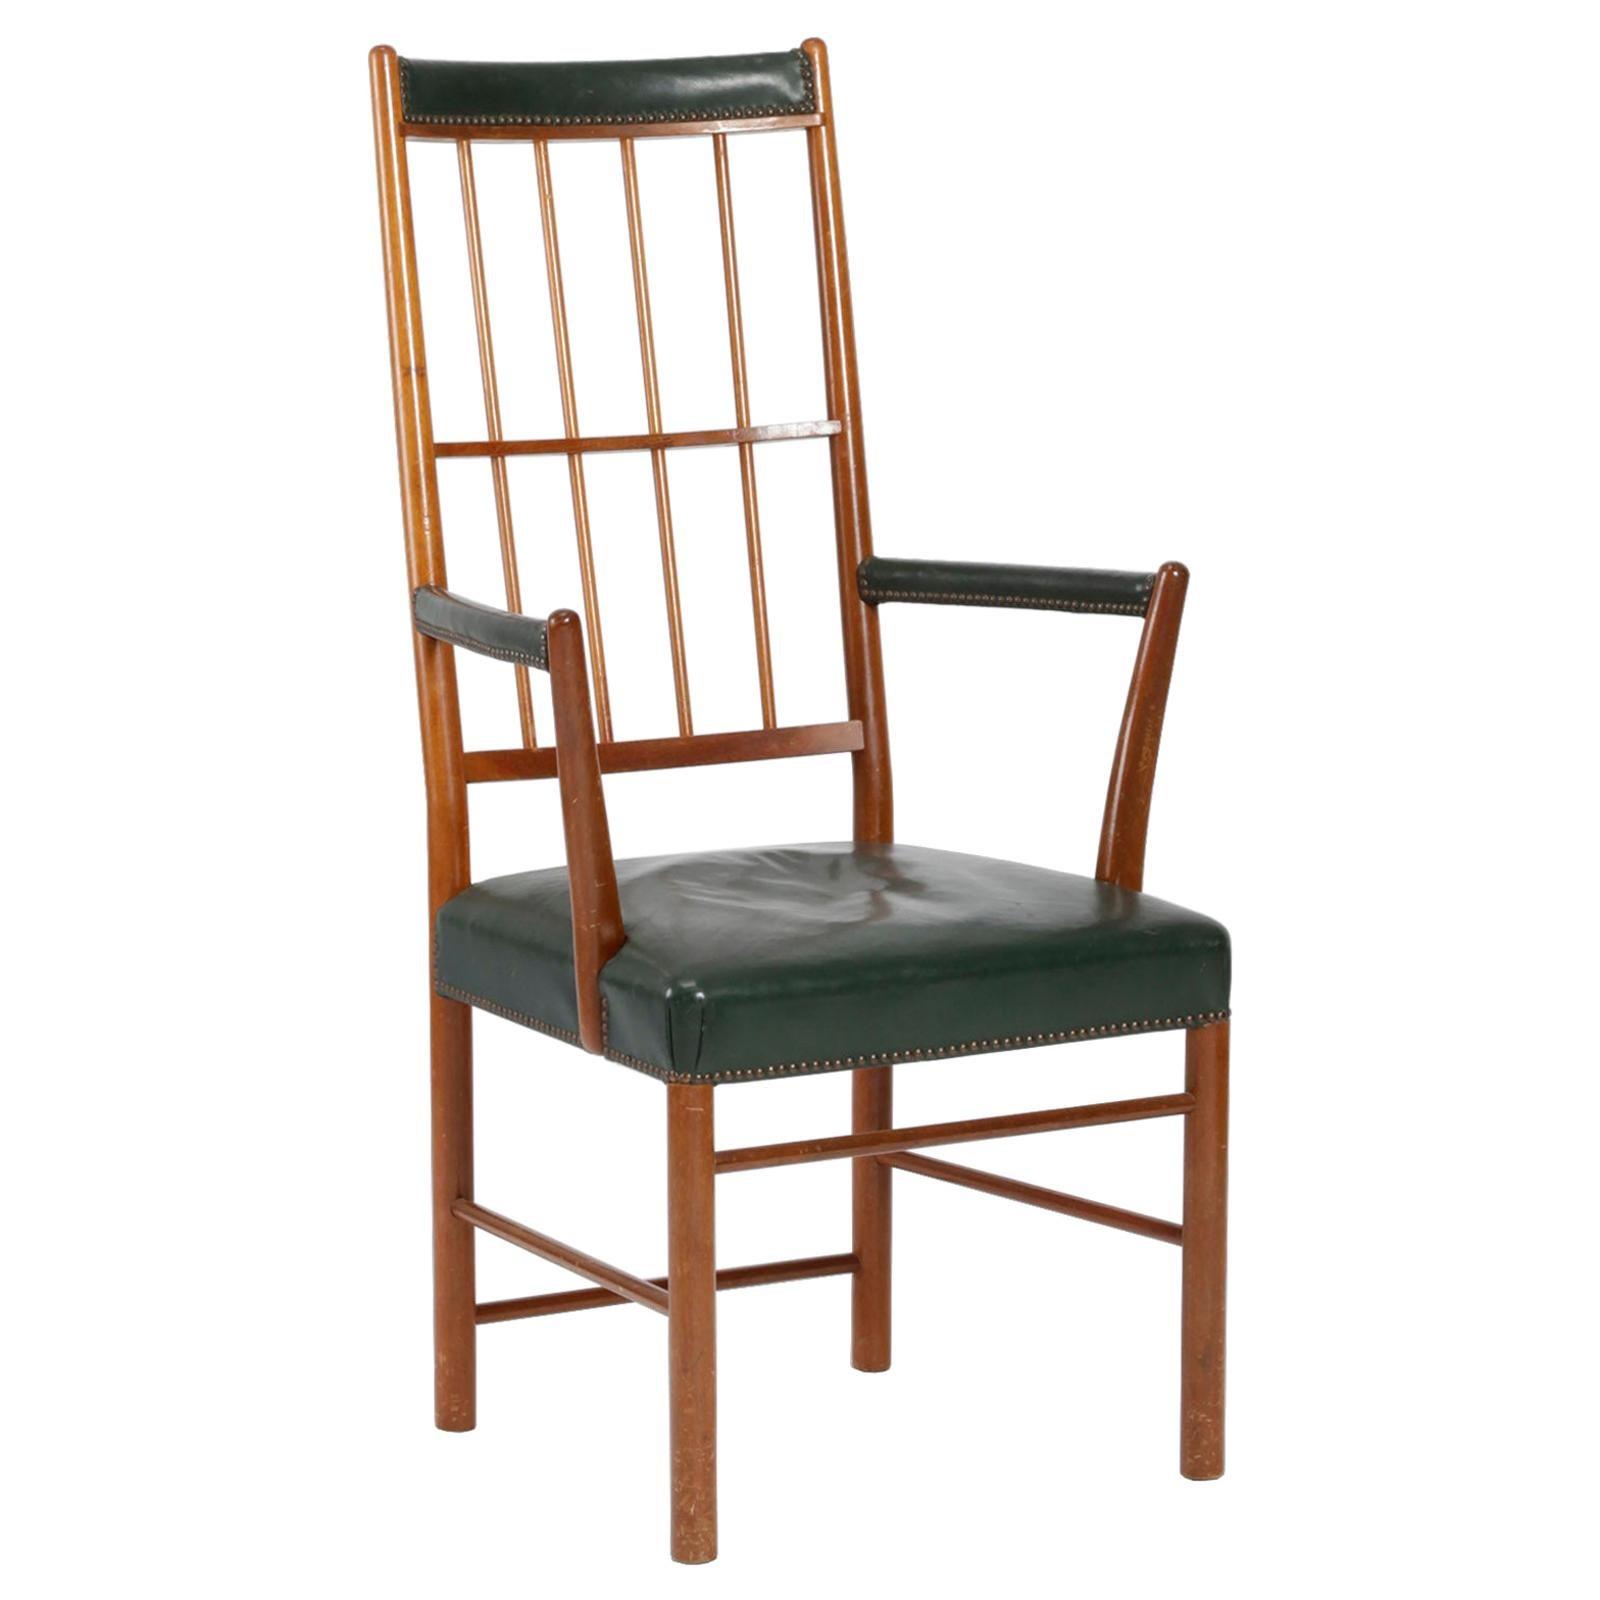 High Back Armchair in Mahogany by Josef Frank for Svenskt Tenn